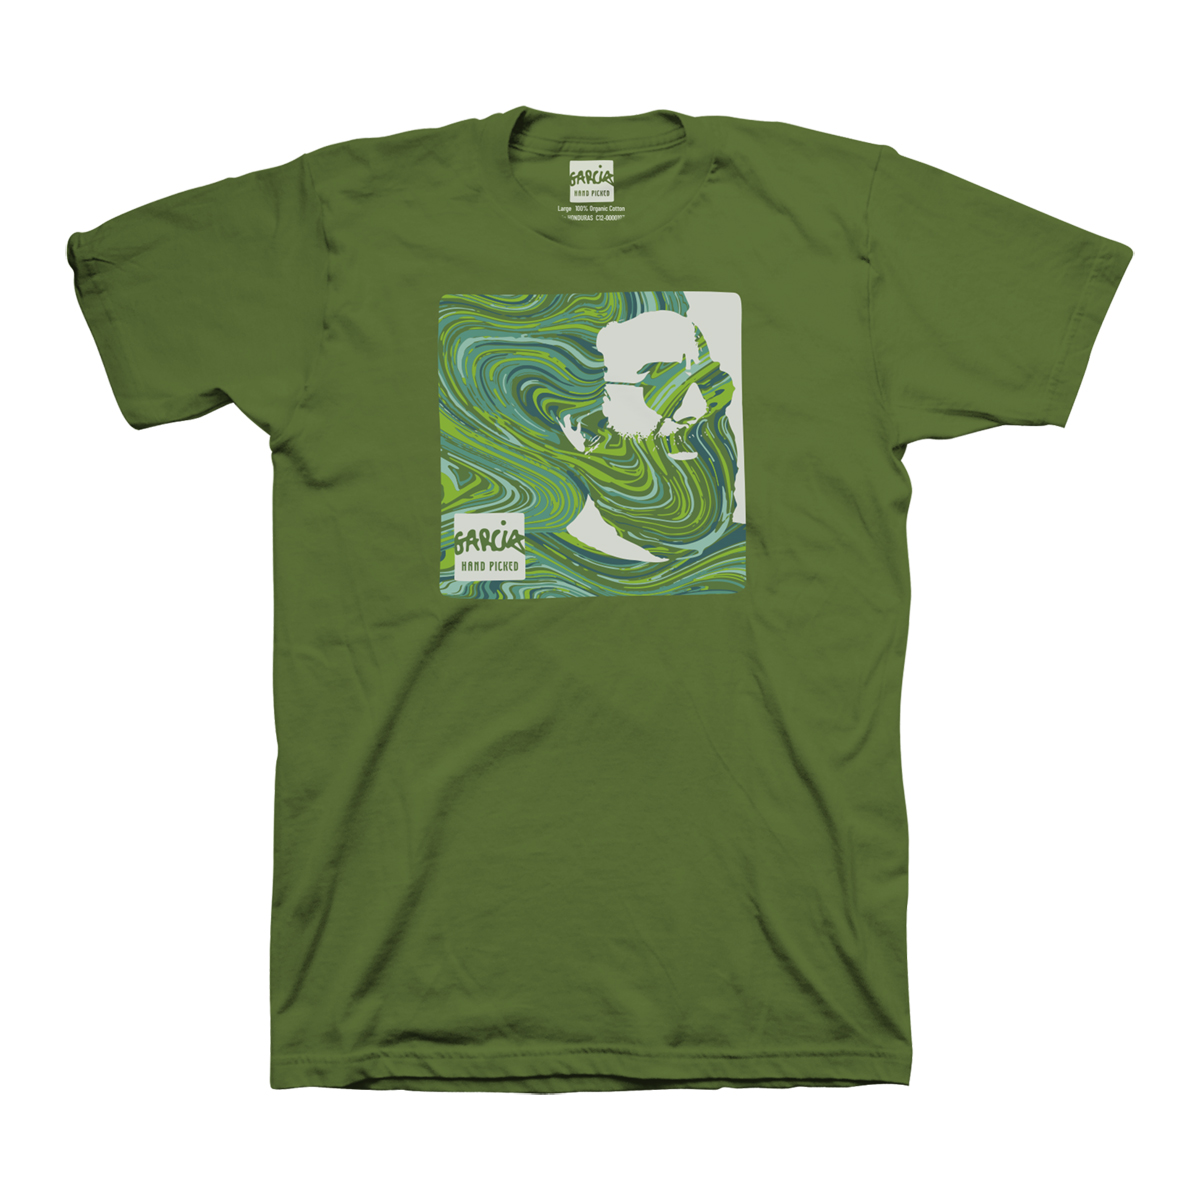 Garcia Hand Picked T-shirt